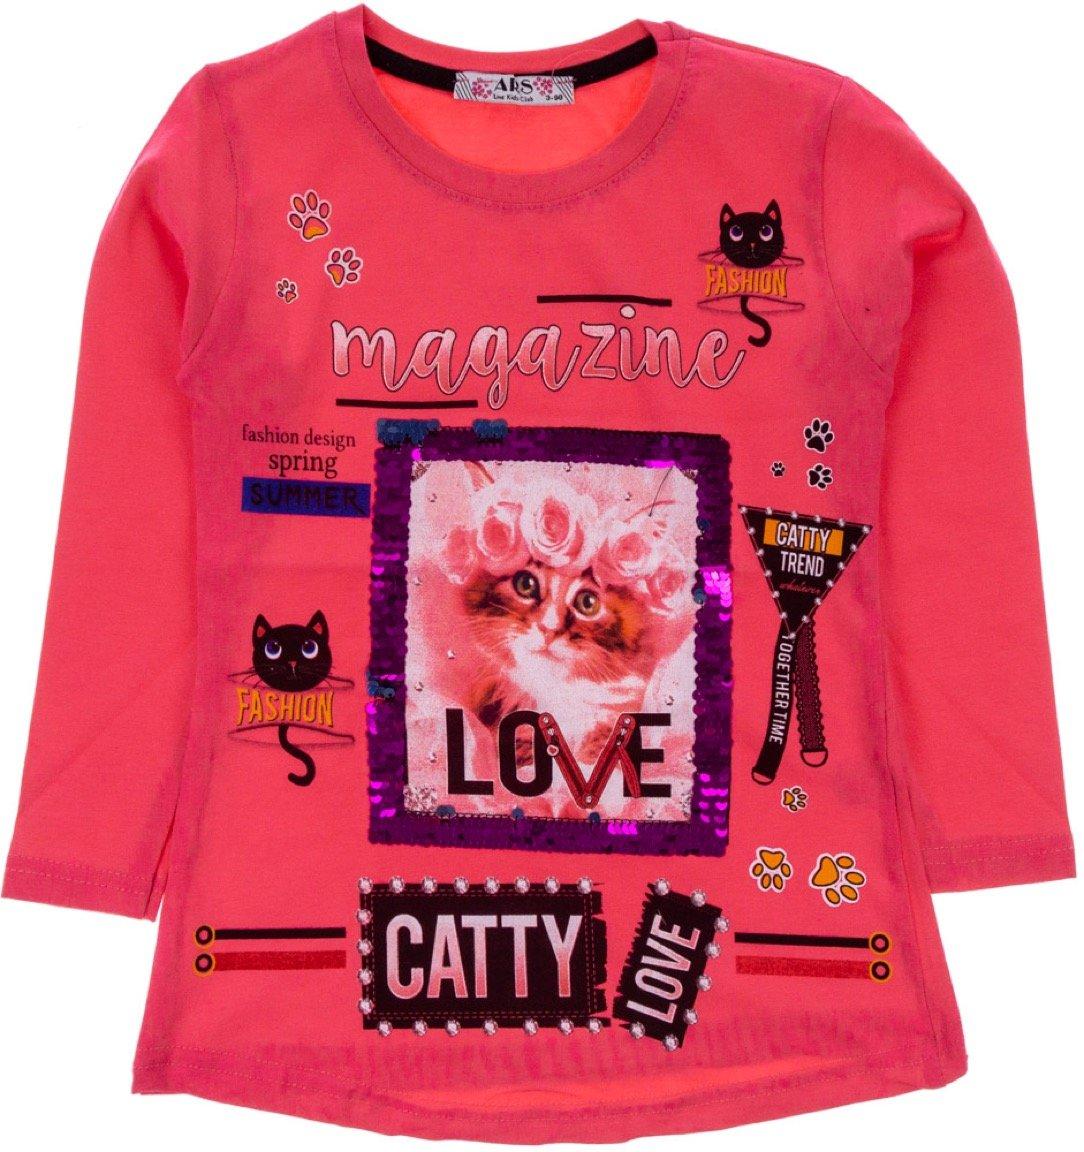 ARS παιδική εποχιακή μπλούζα «Catty Love»